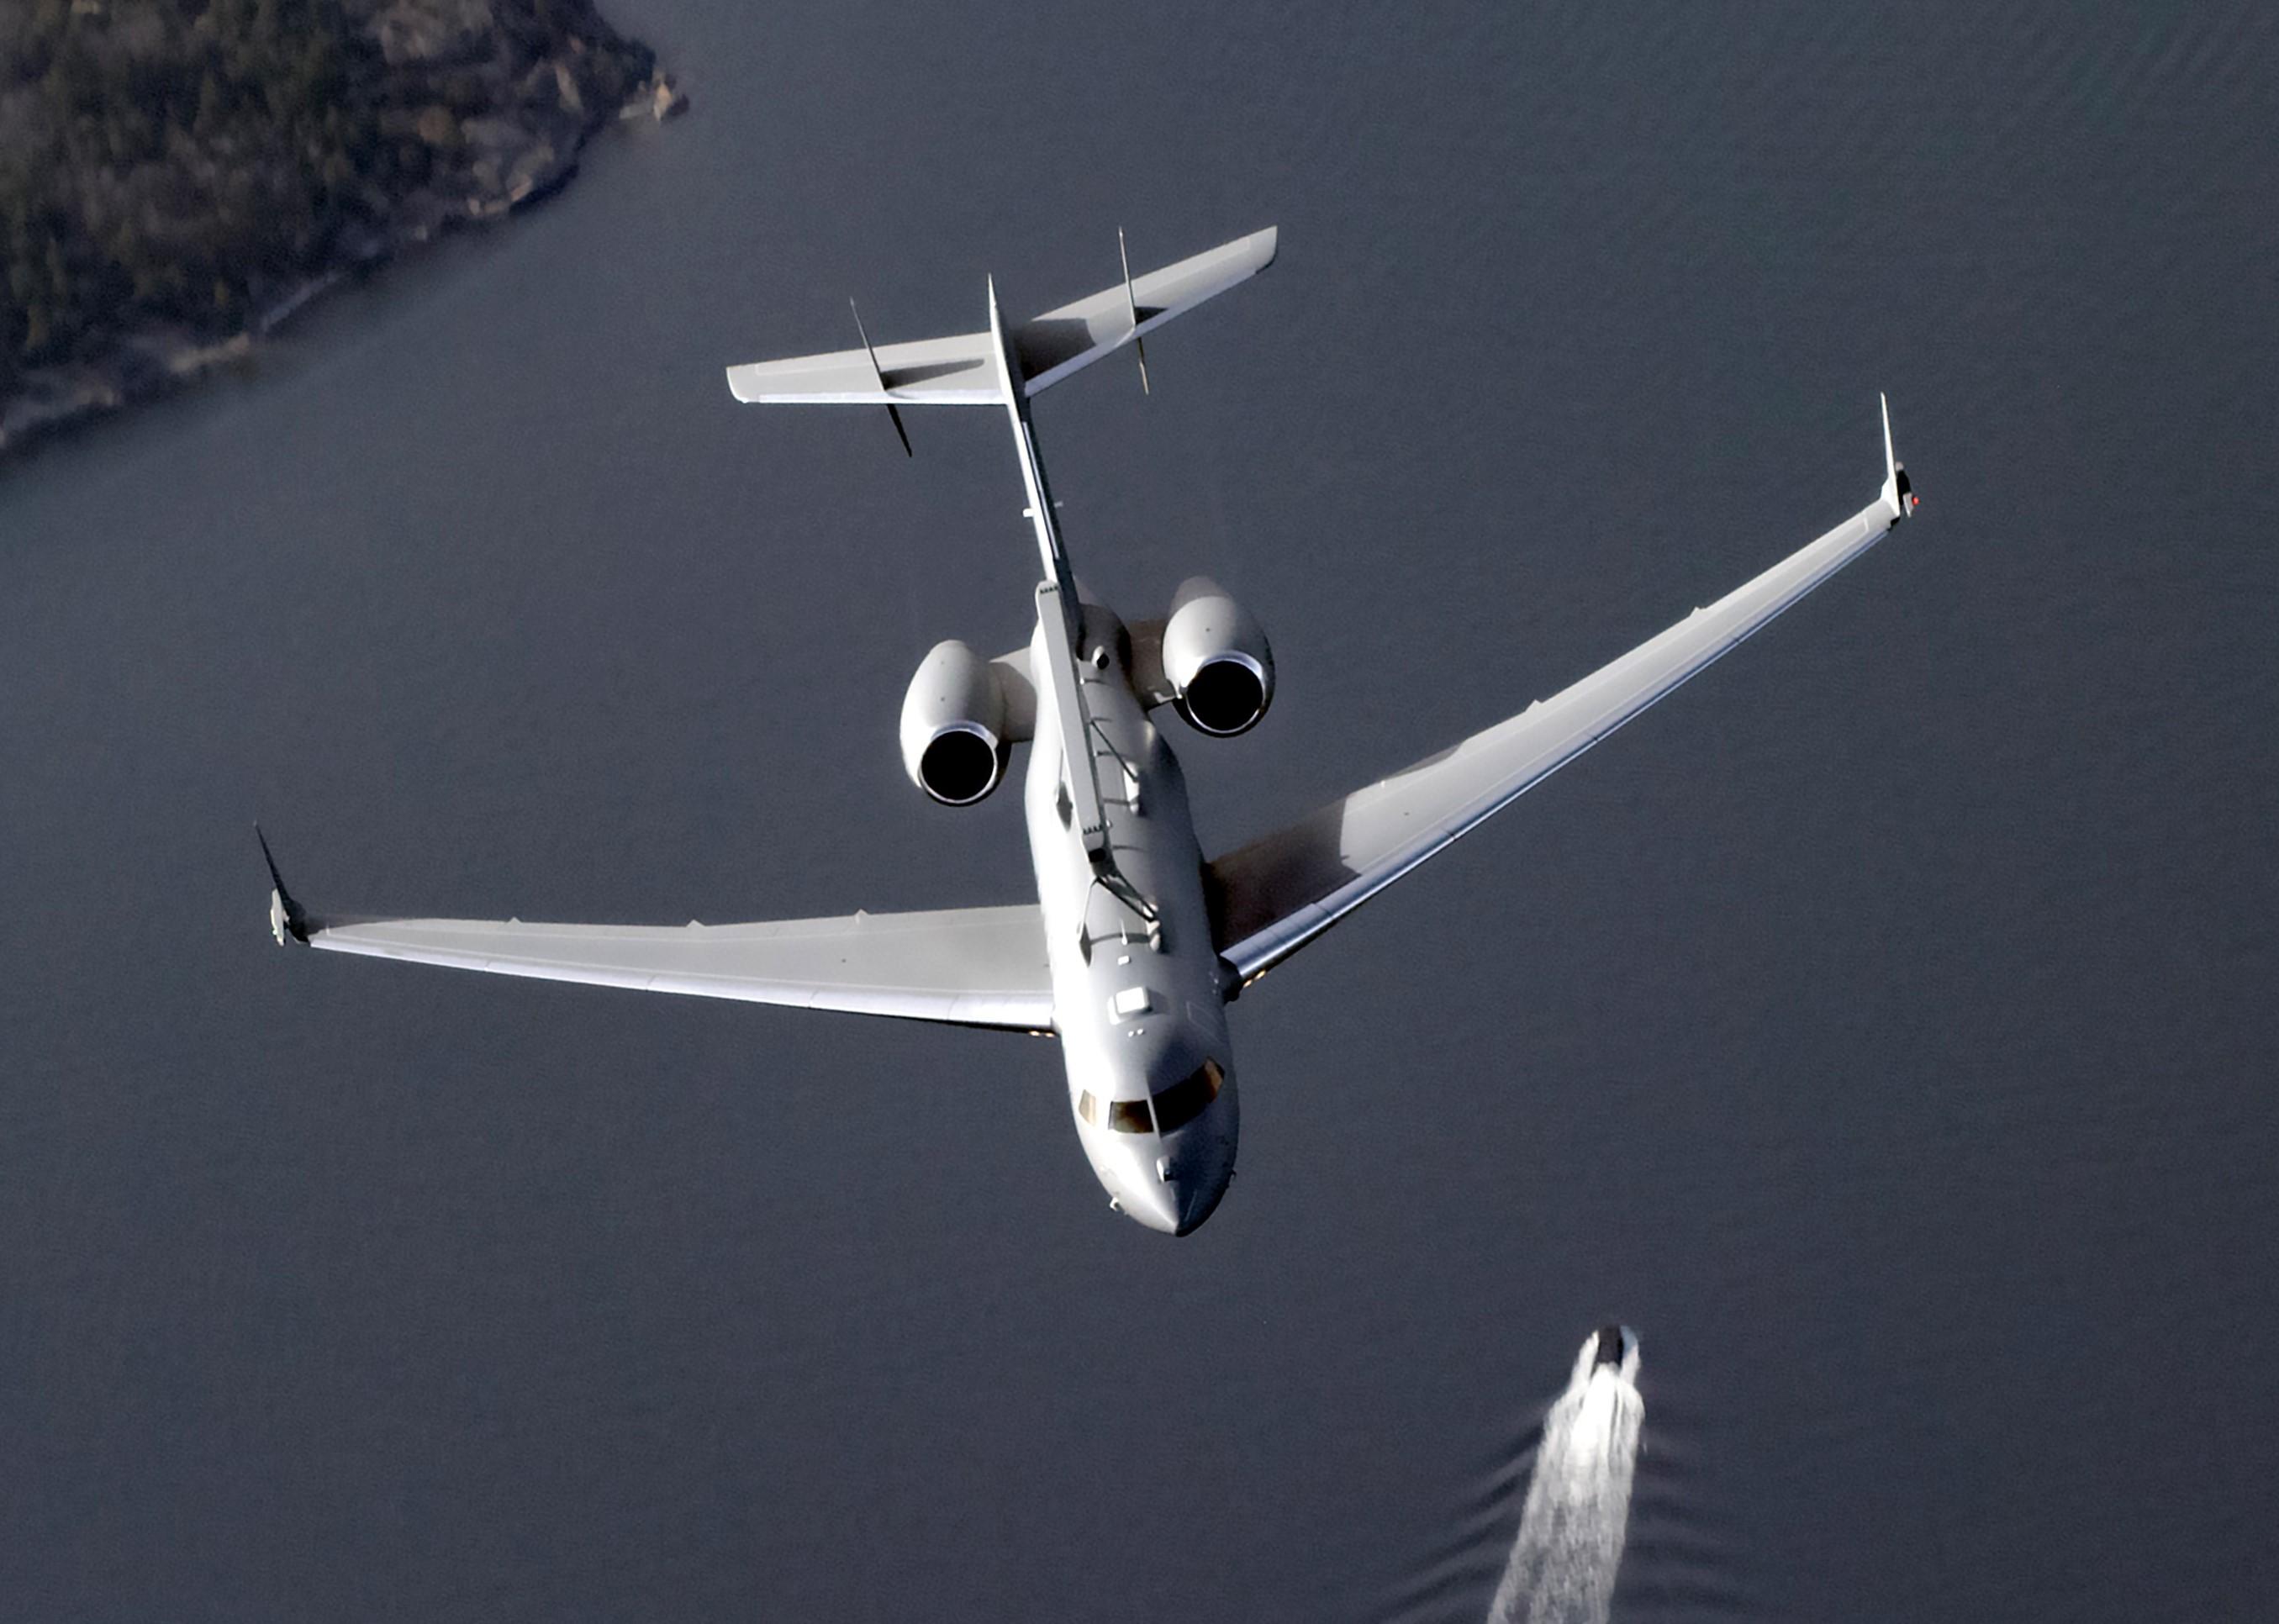 UAE receives third GlobalEye surveillance aircraft